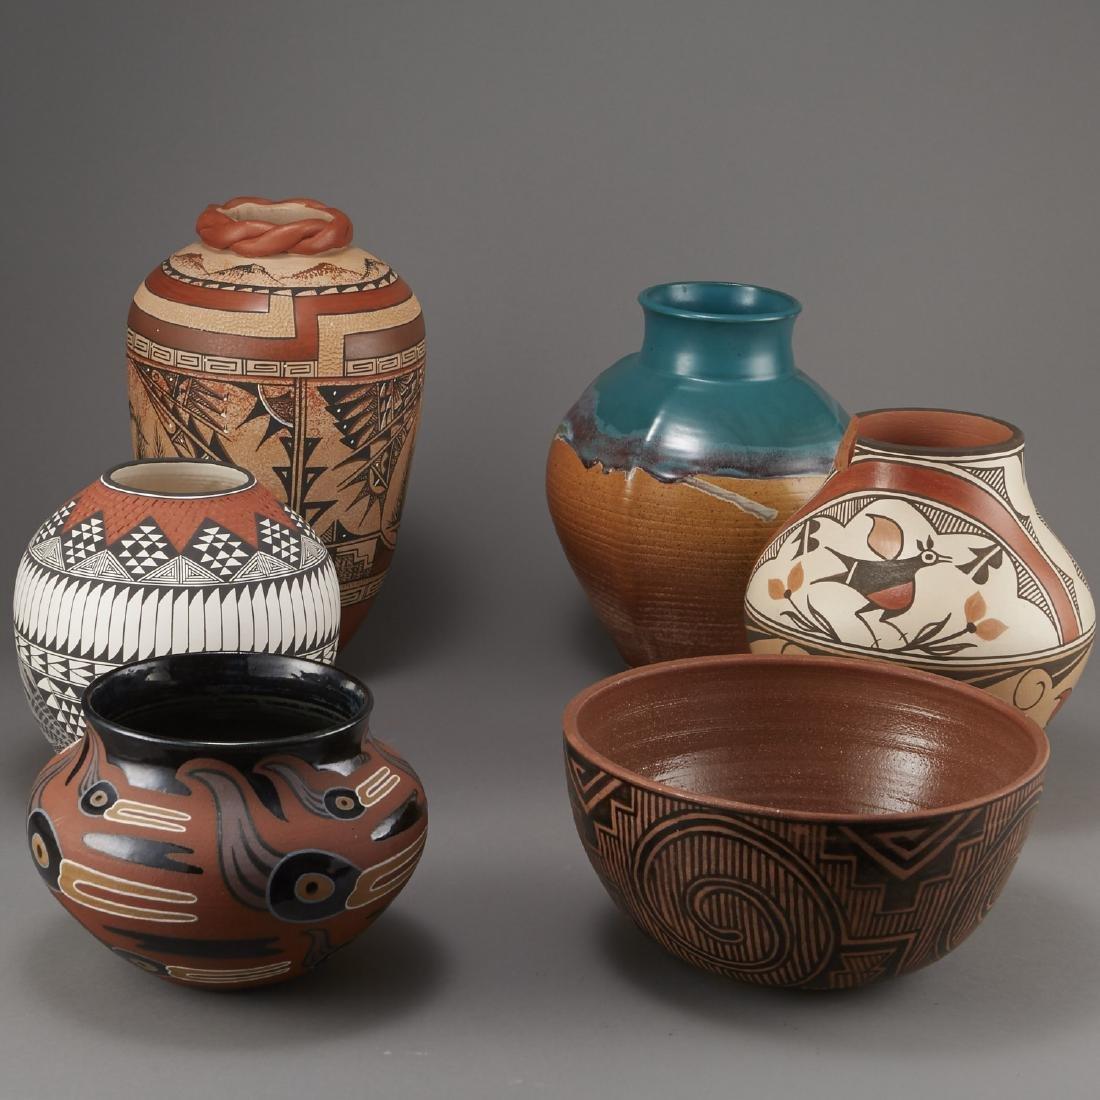 6 Pueblo Pottery Pots incld Fragua, Nez, Medina - 3